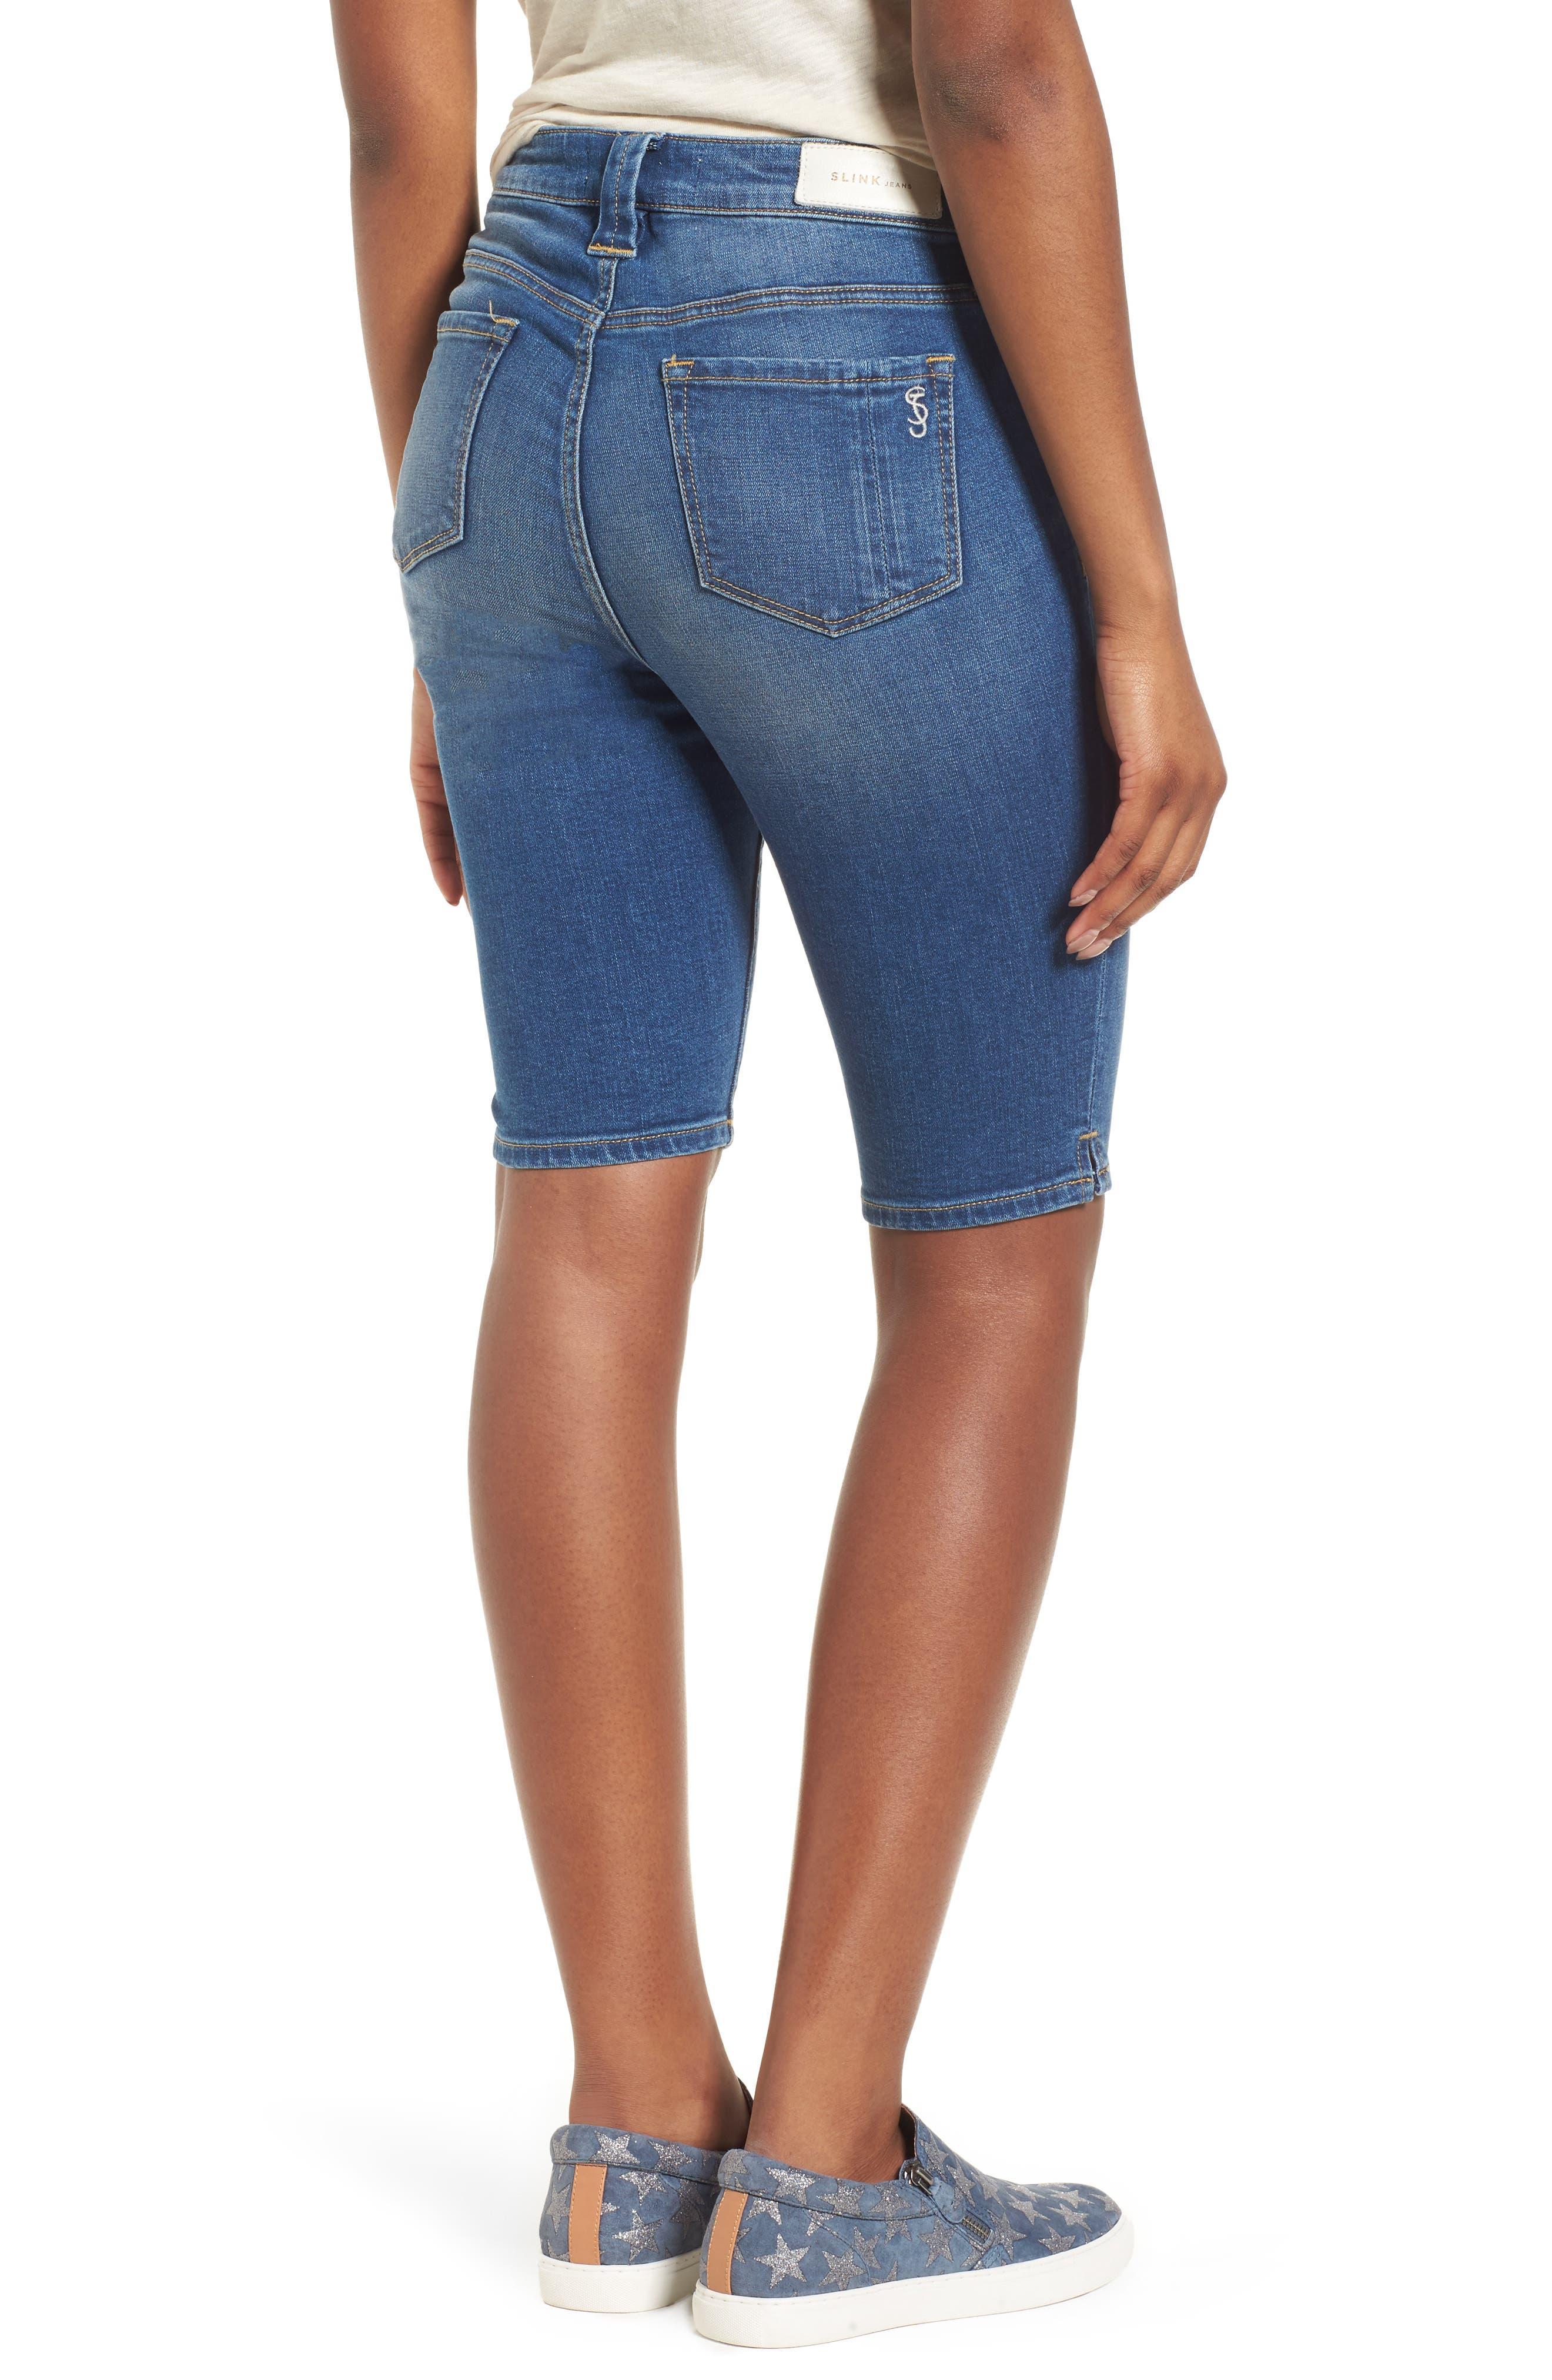 Bermuda Shorts,                             Alternate thumbnail 2, color,                             BIRDY